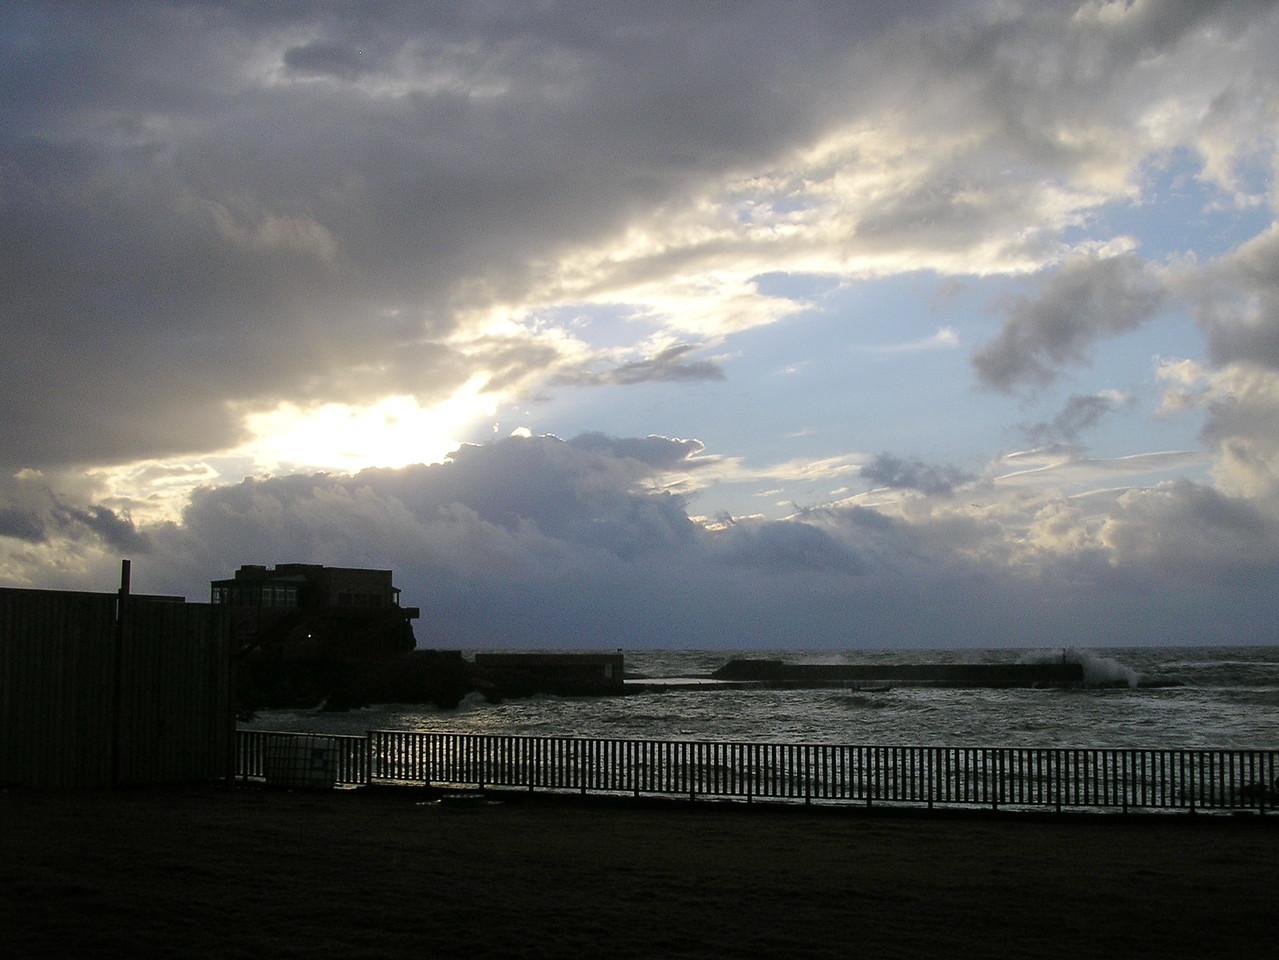 Mediterranean Sea at Dusk